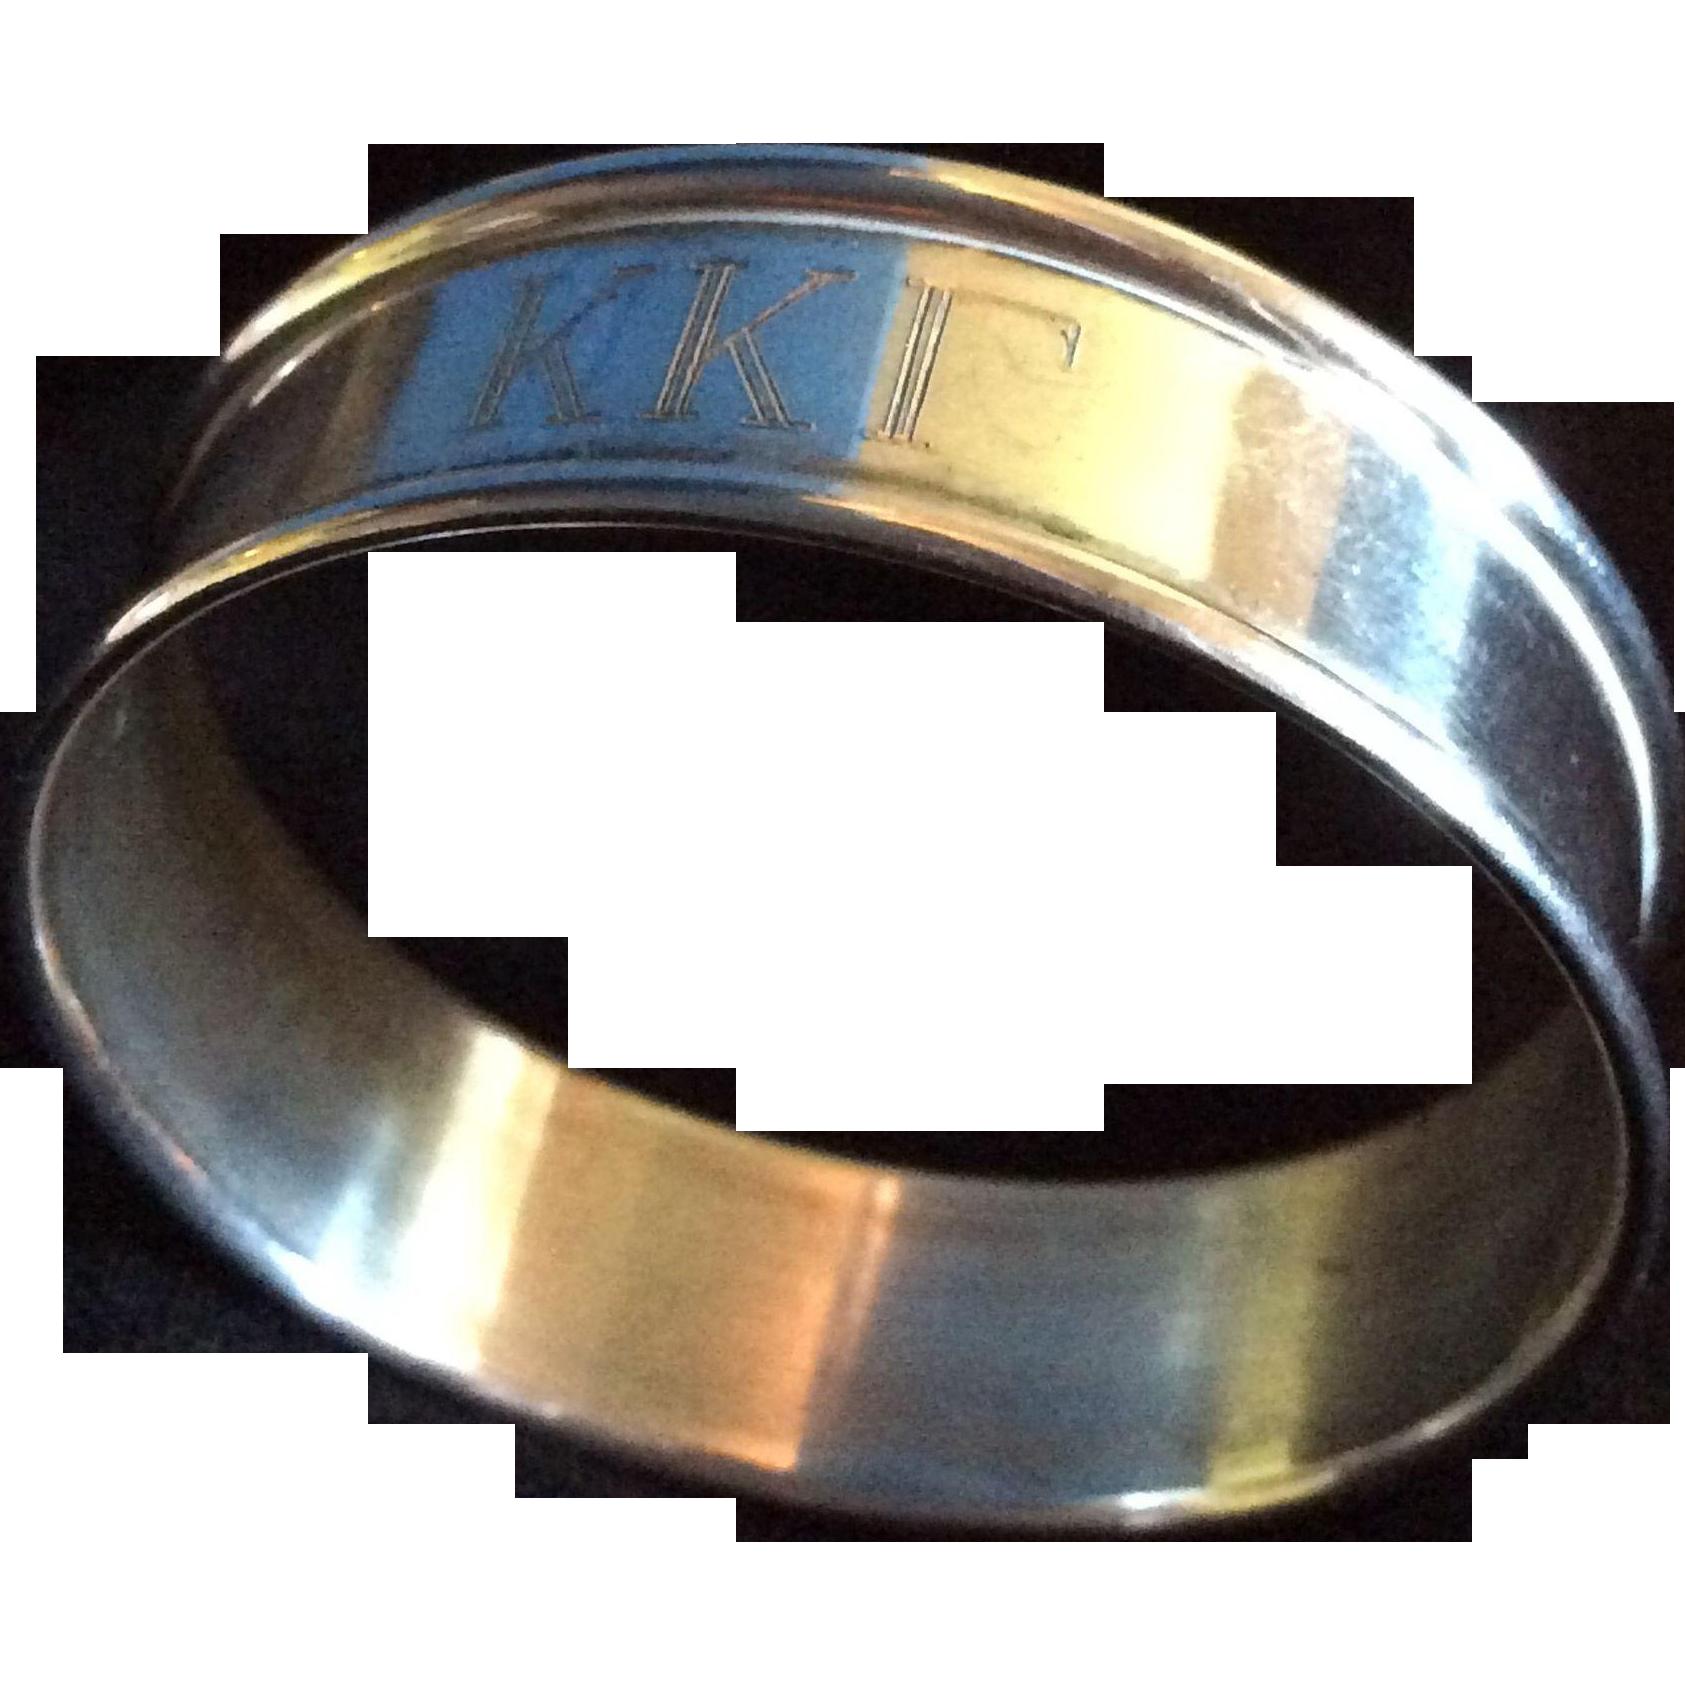 Kappa Kappa Gamma Sterling silver Napkin Ring or Serviette Holder